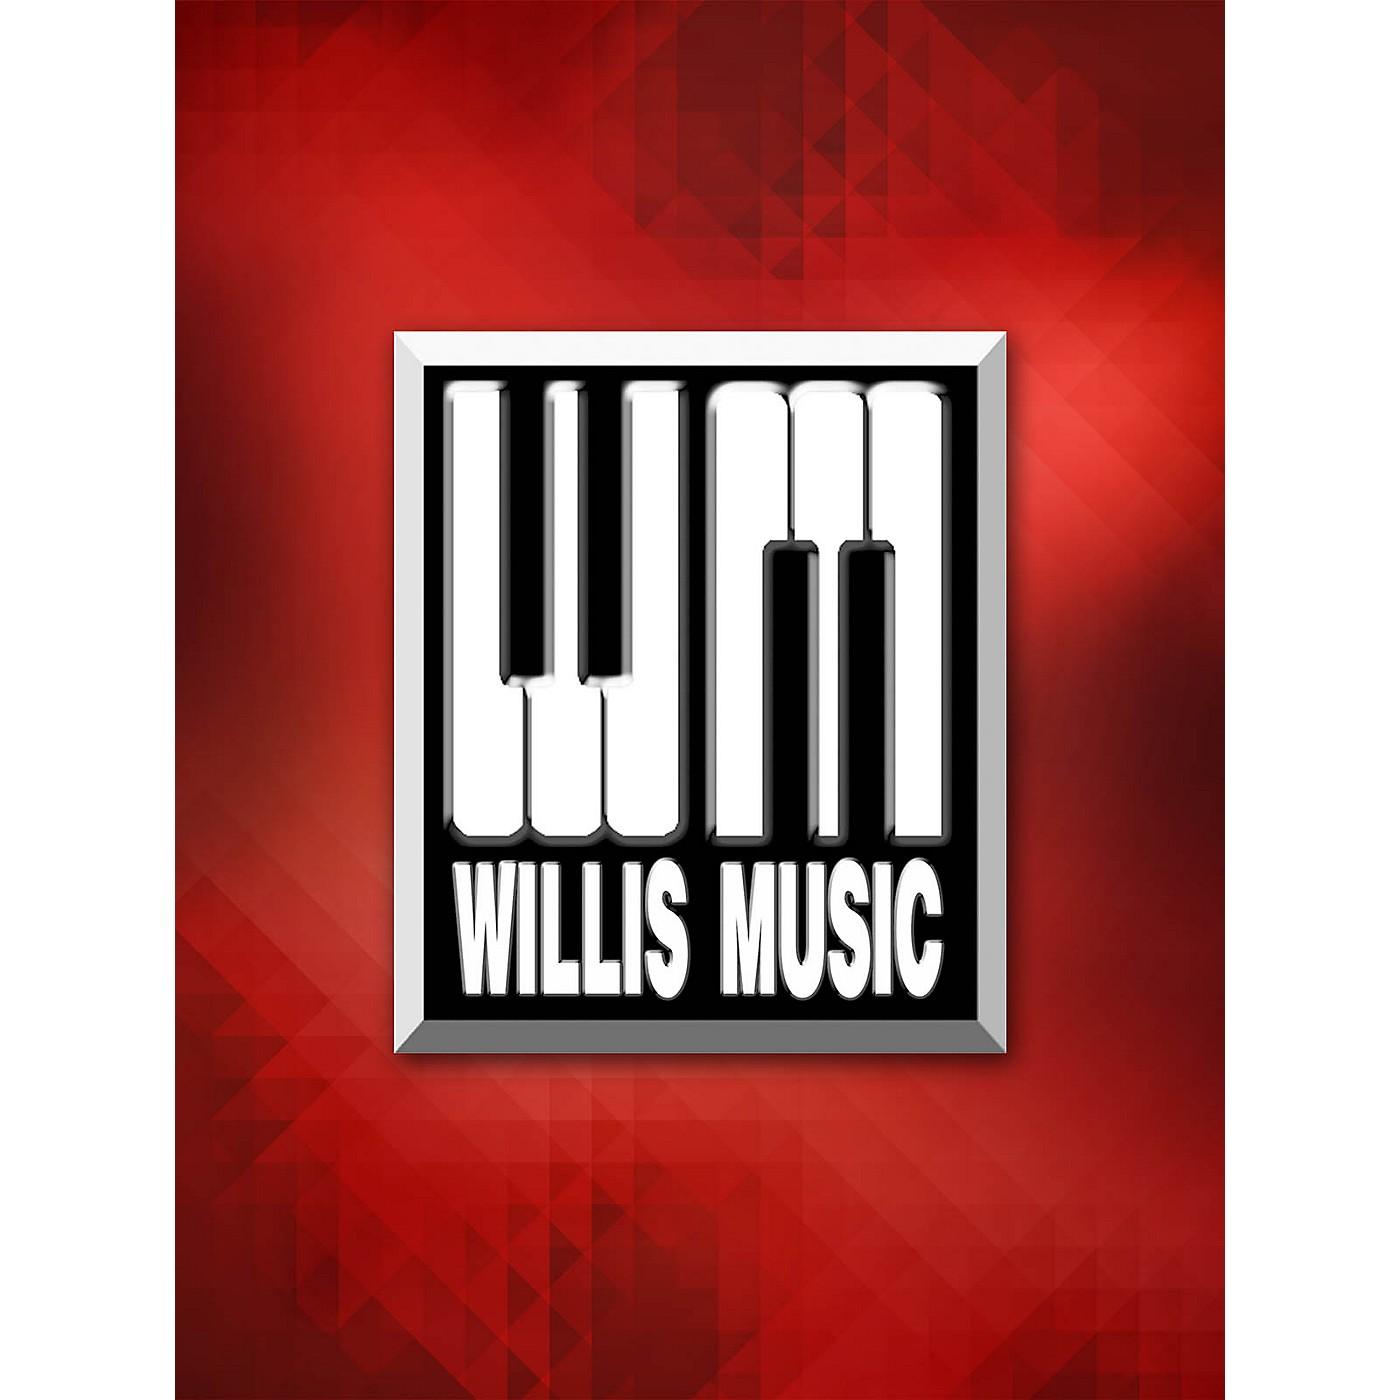 Willis Music Twenty-Five Progressive Studies Opus 100 Willis Series by Friedrich Burgmüller (Level Early to Mid-Inter) thumbnail